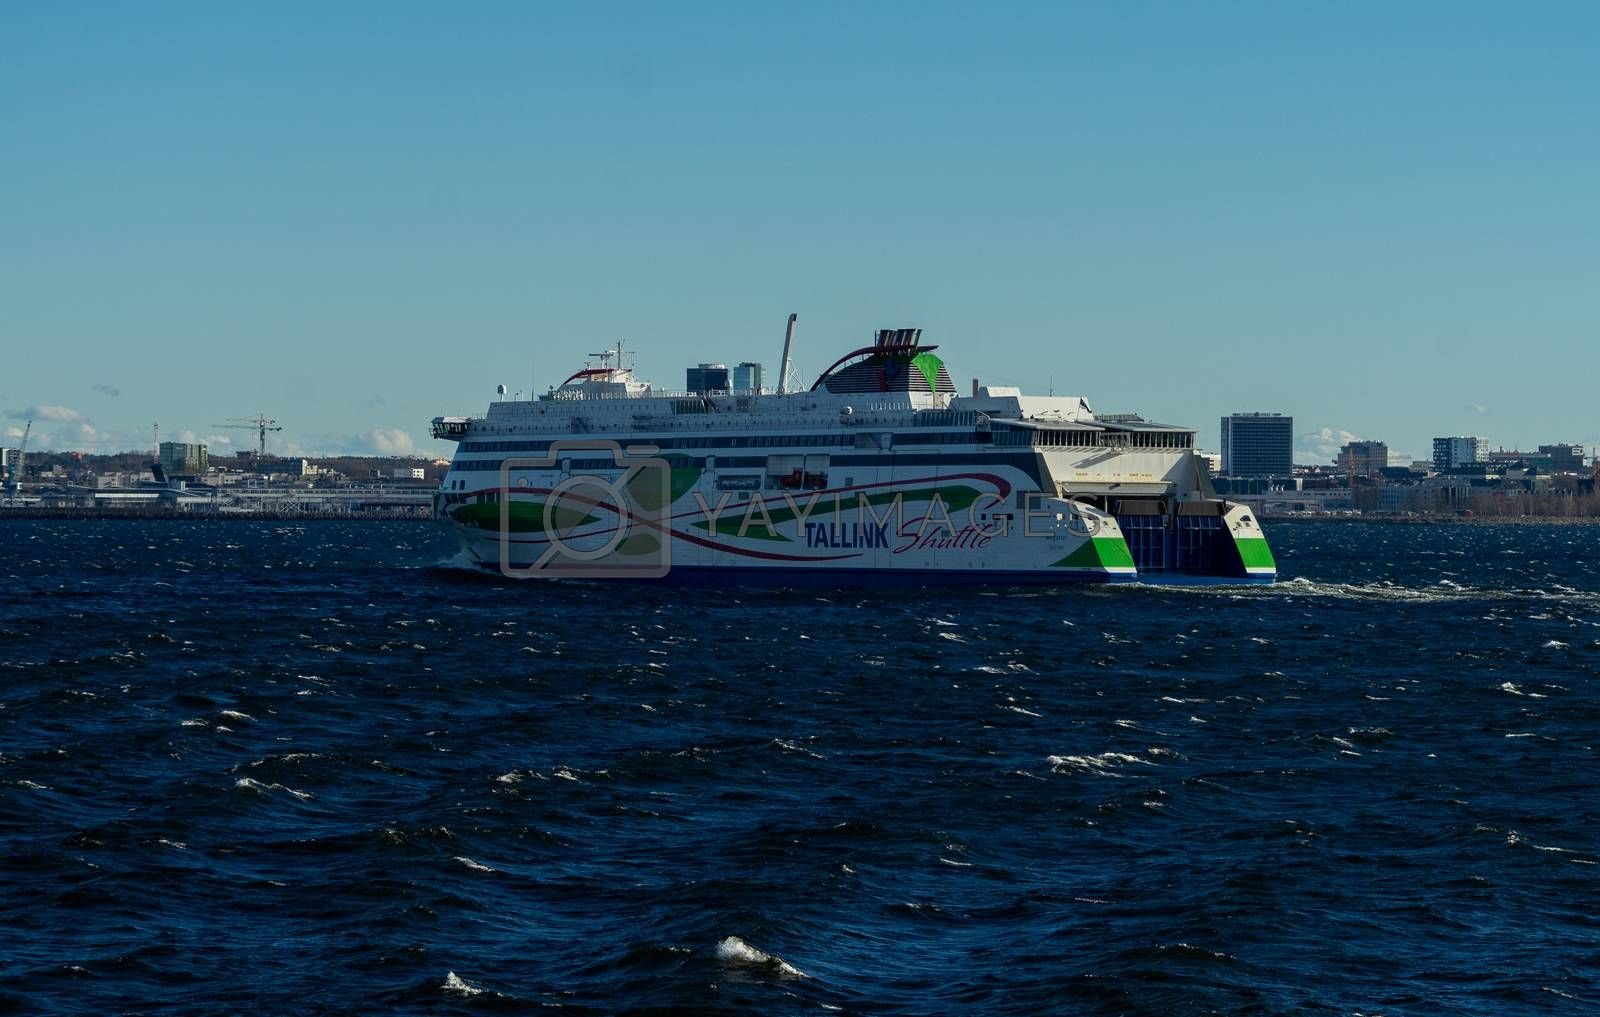 21 April 2019, Tallinn, Estonia. High-speed passenger and car ferry of the Estonian shipping concern Tallink Megastar in the port of Tallinn.